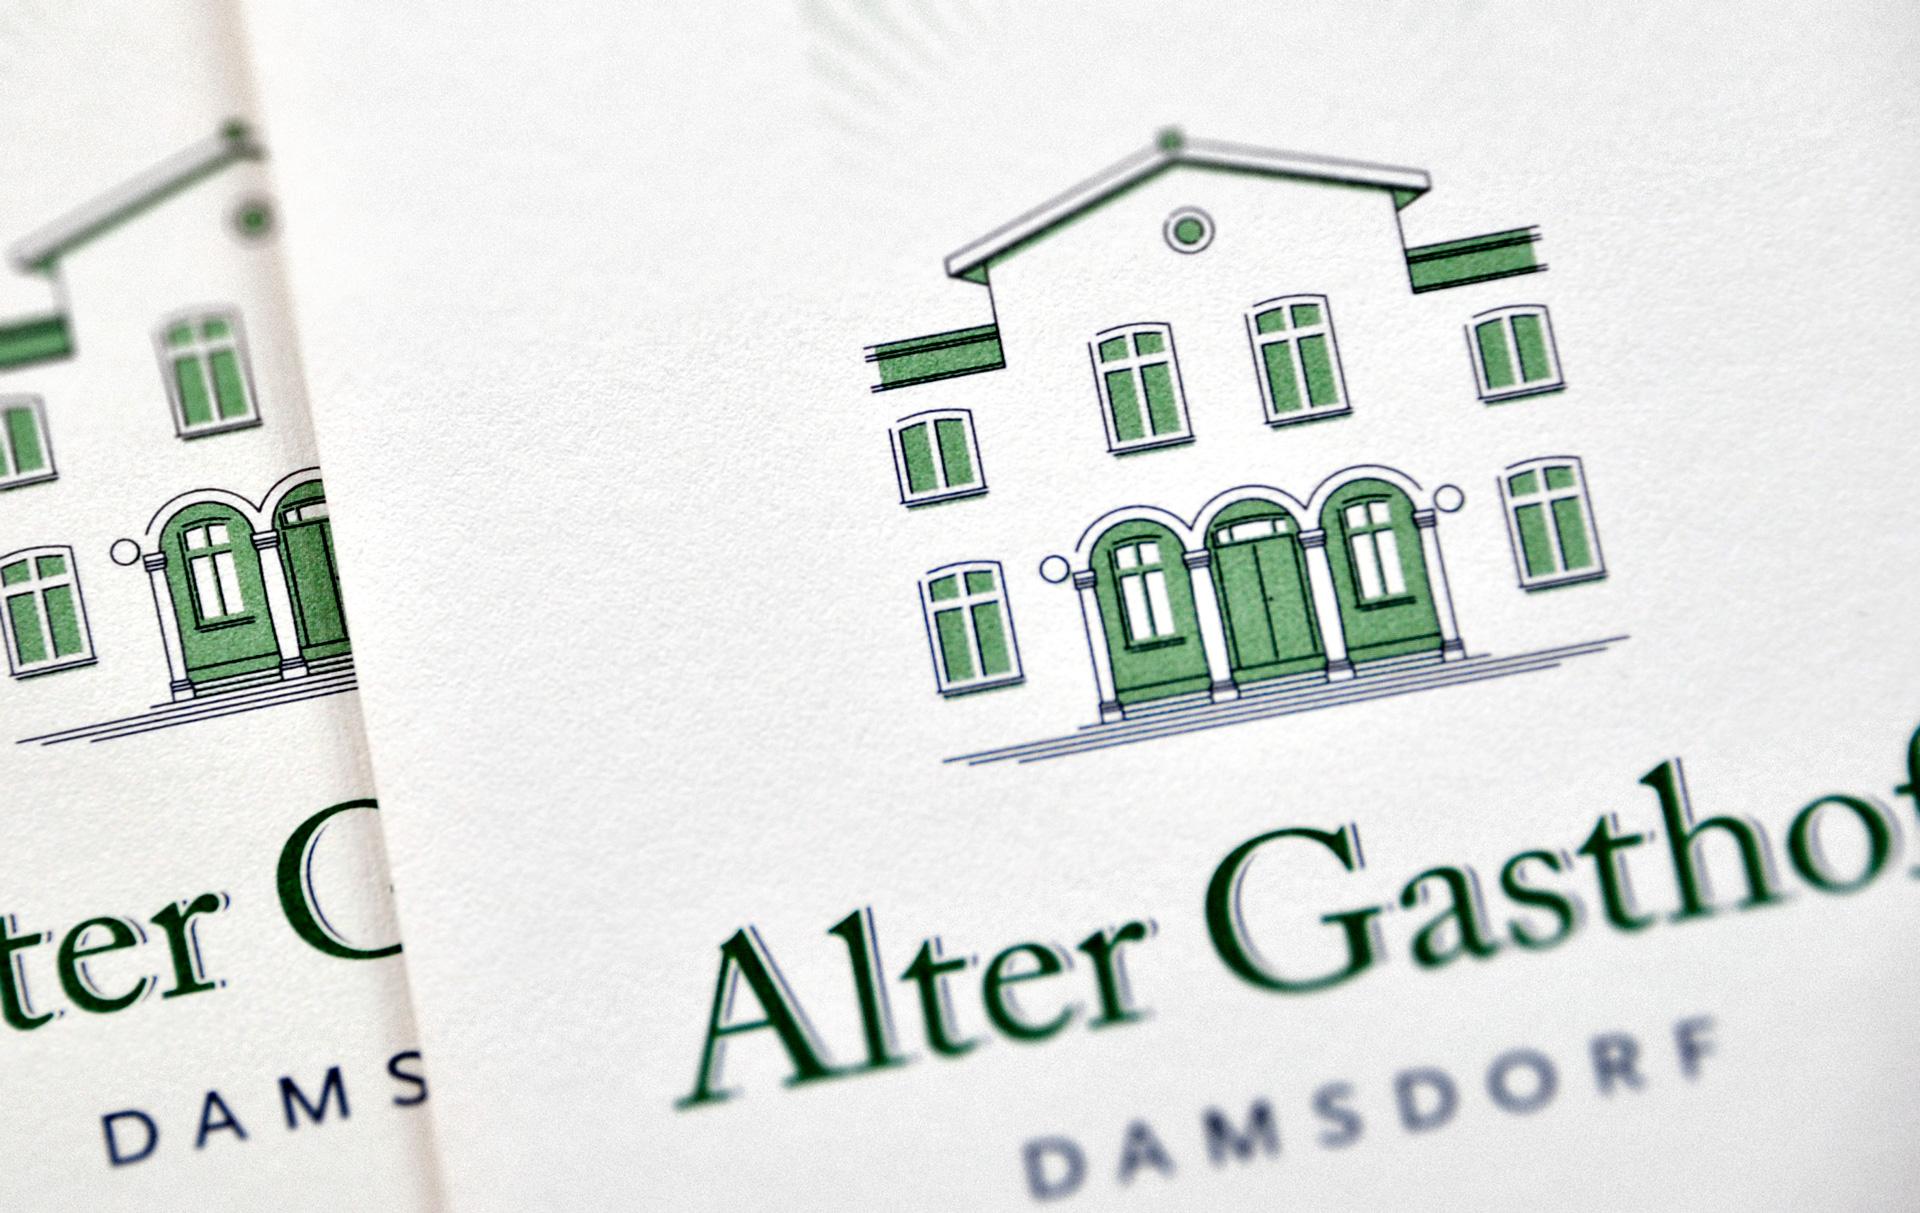 Alter Gasthof Damsdorf, Wort-Bildmarke